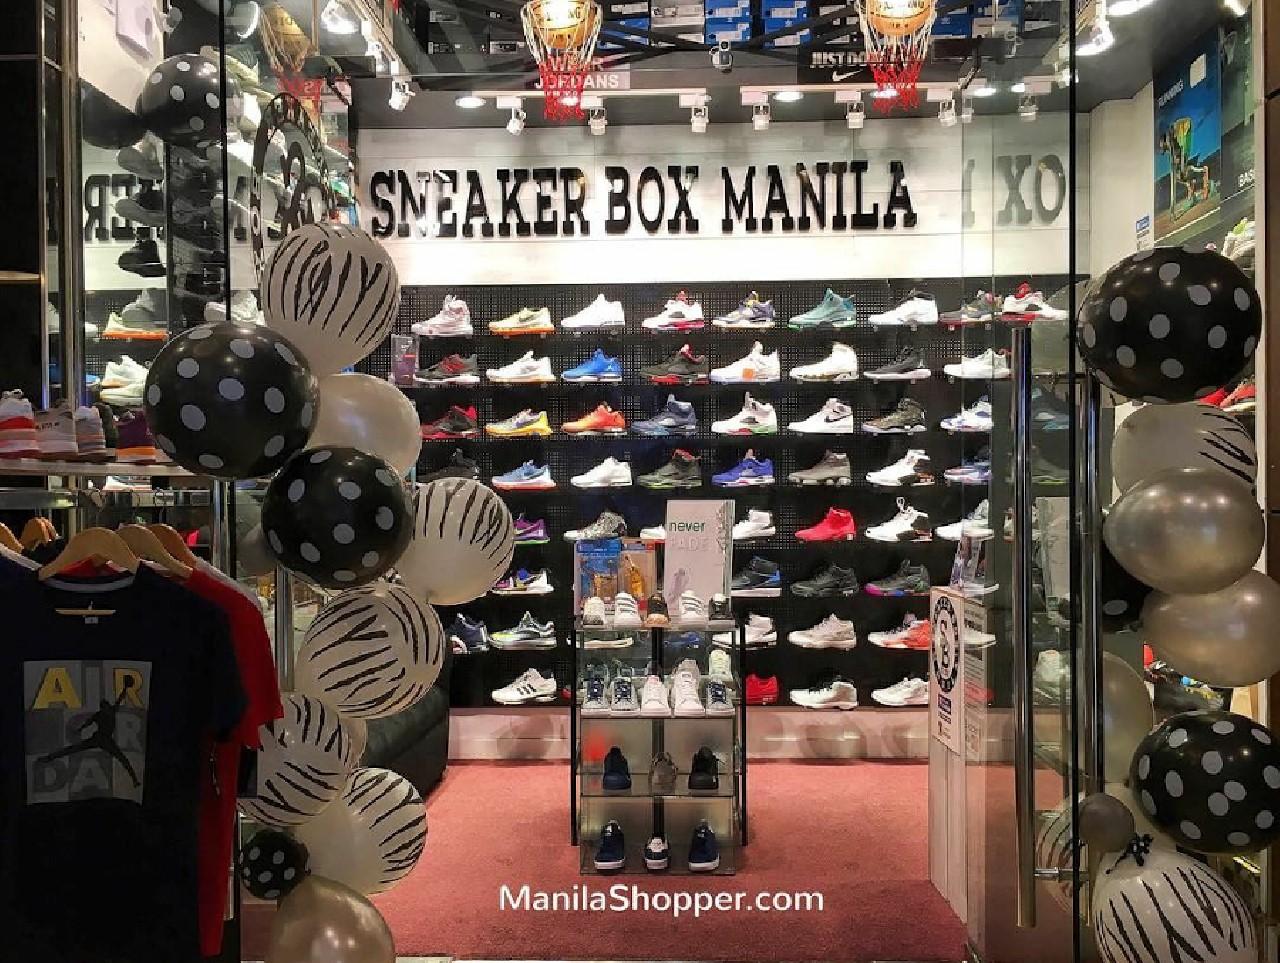 454032e0f Manila Shopper  Adidas NMD at Sneaker Box Manila